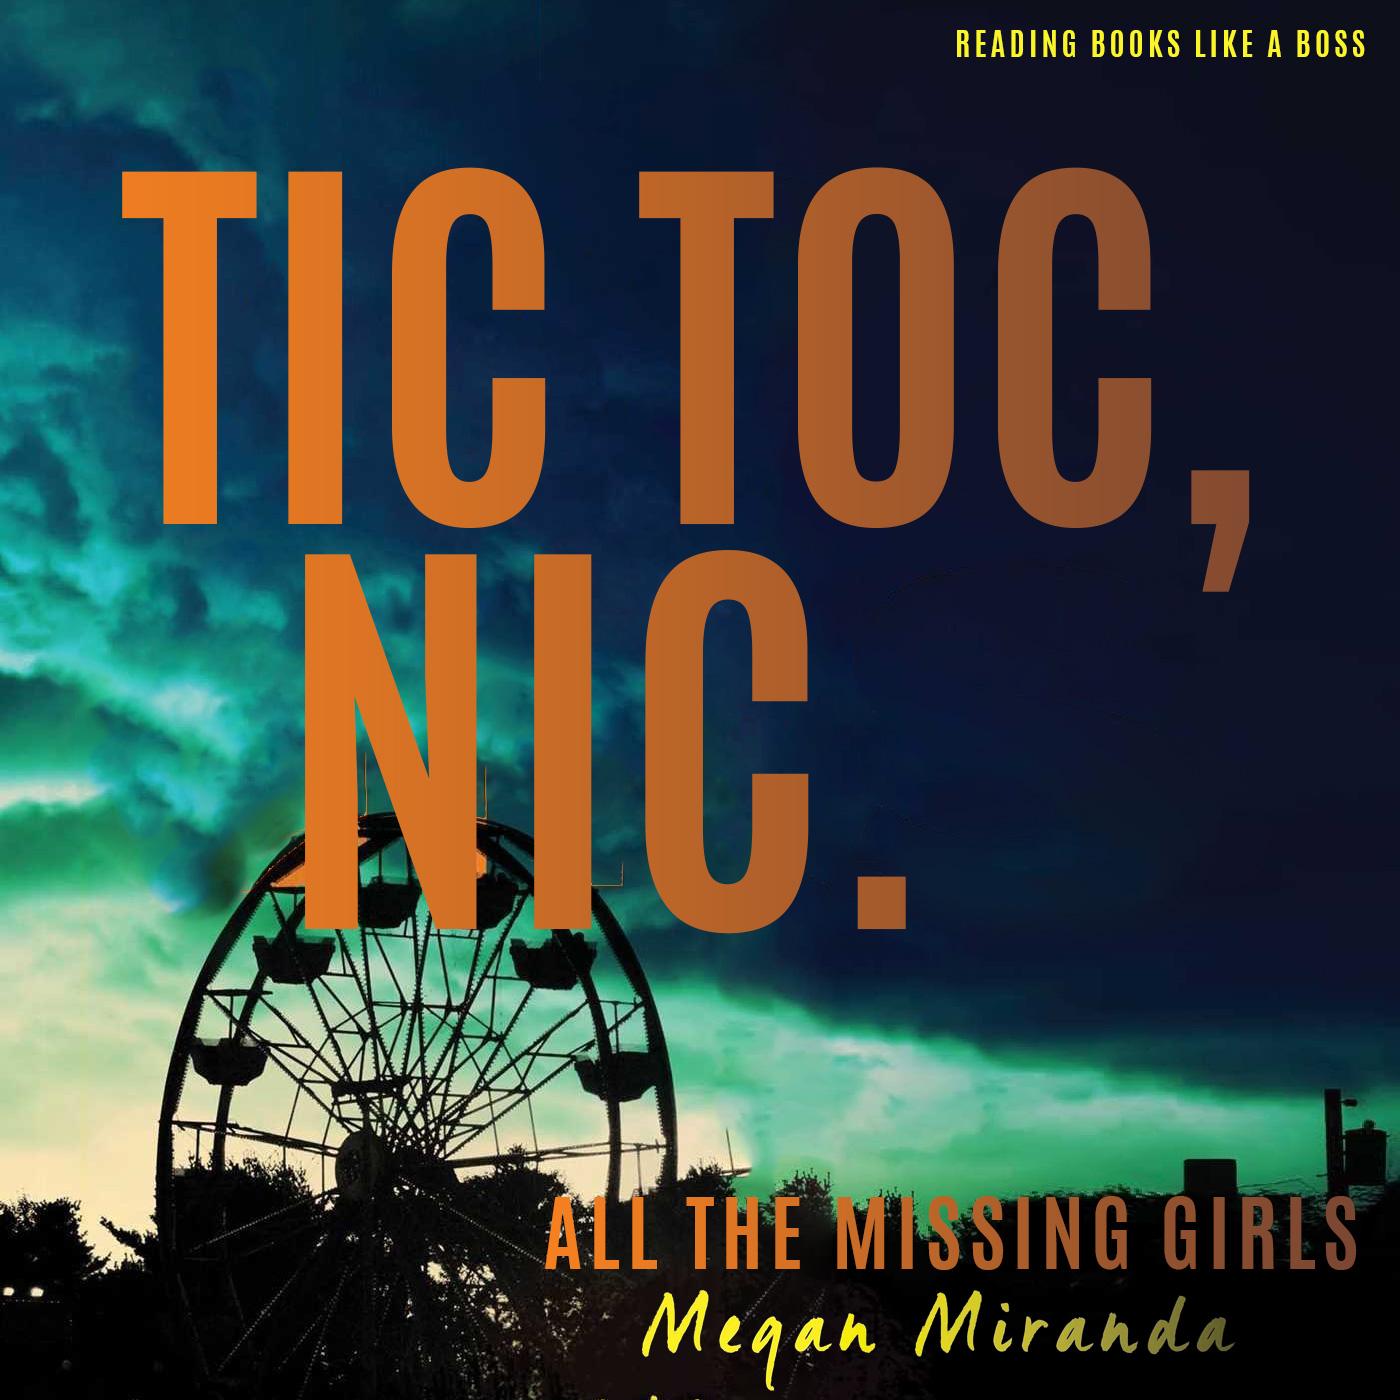 TEASER - All the Missing Girls by Megan Miranda